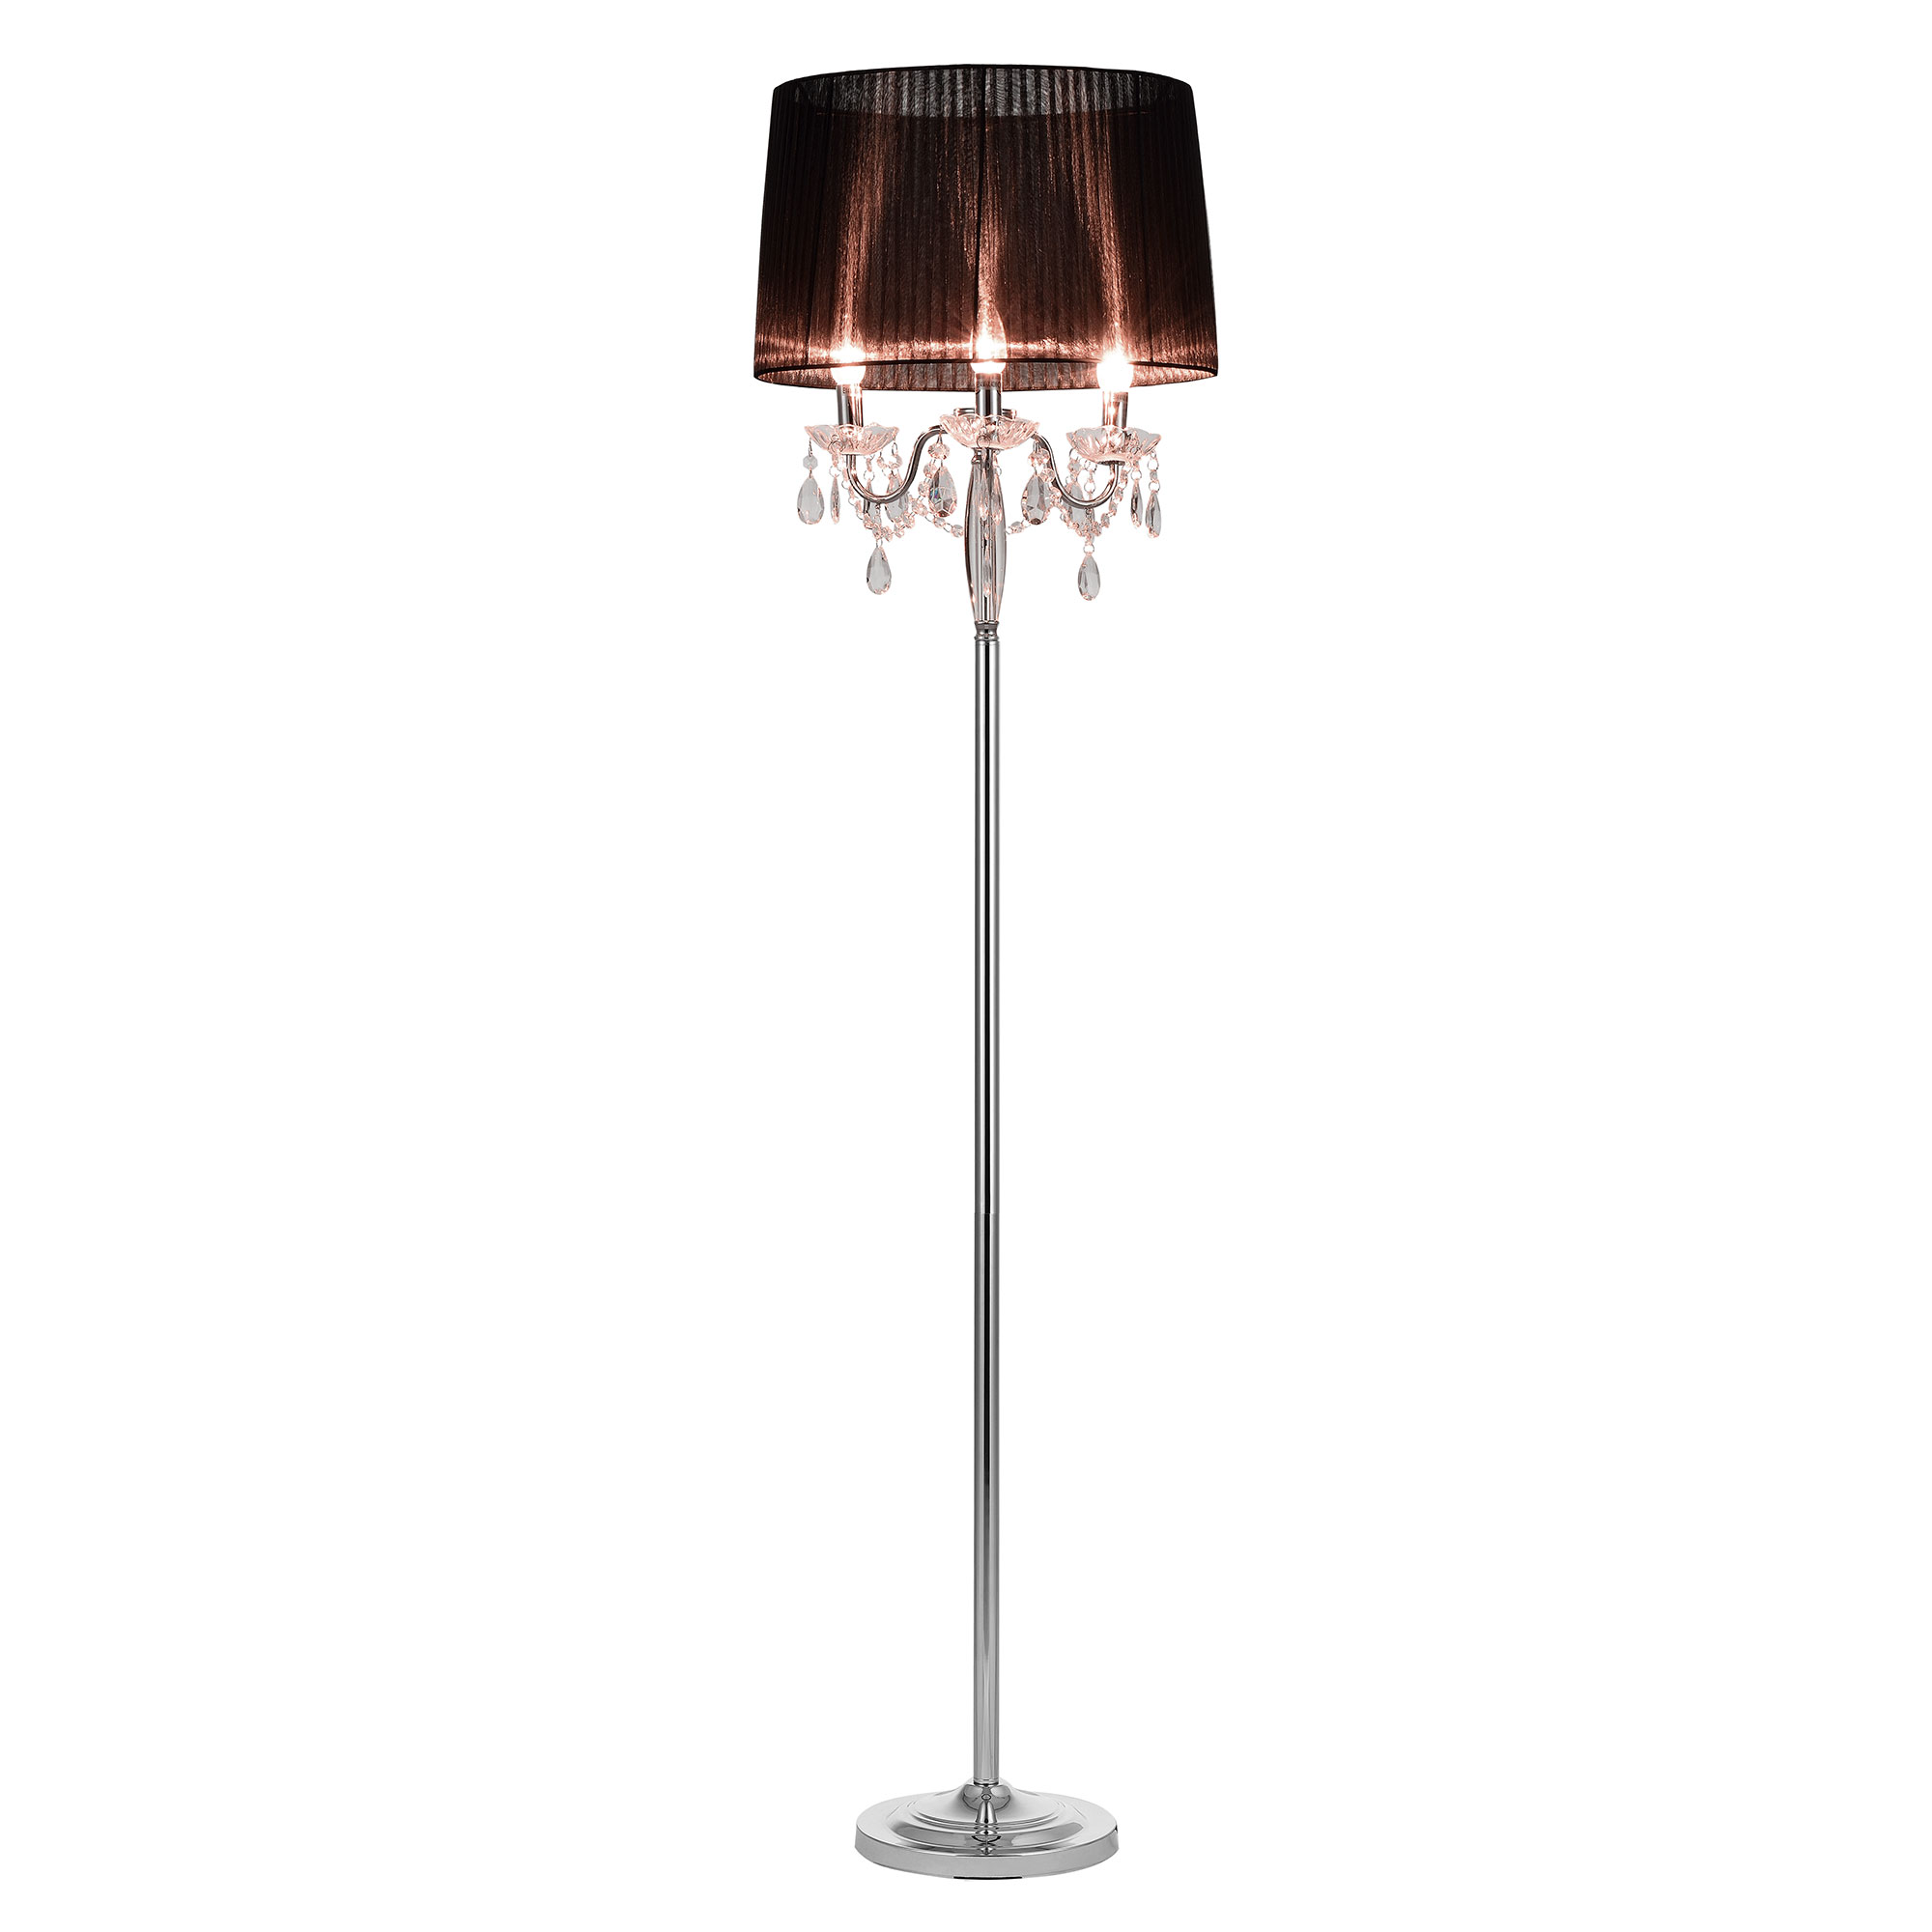 [lux.pro]® Lampa de podea eleganta – Noble Black 3 x E 14 – 40W – negru / crom